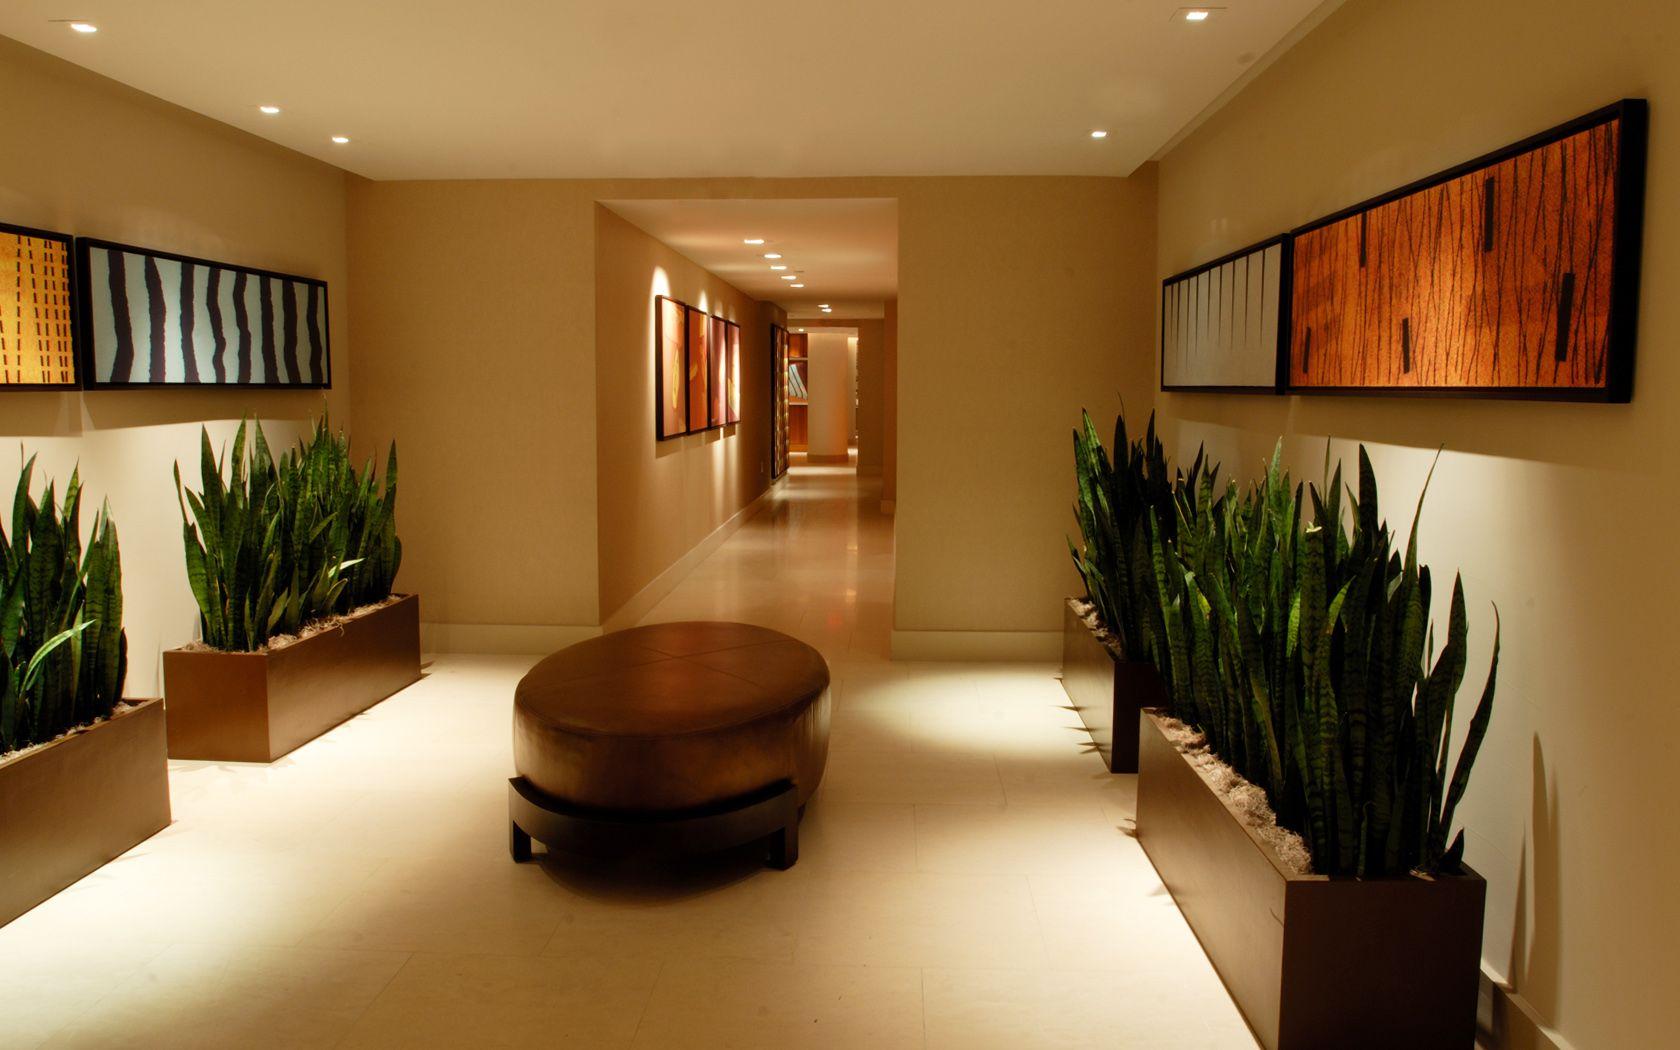 Diplomat Interior Design Firms Commercial Interior Design